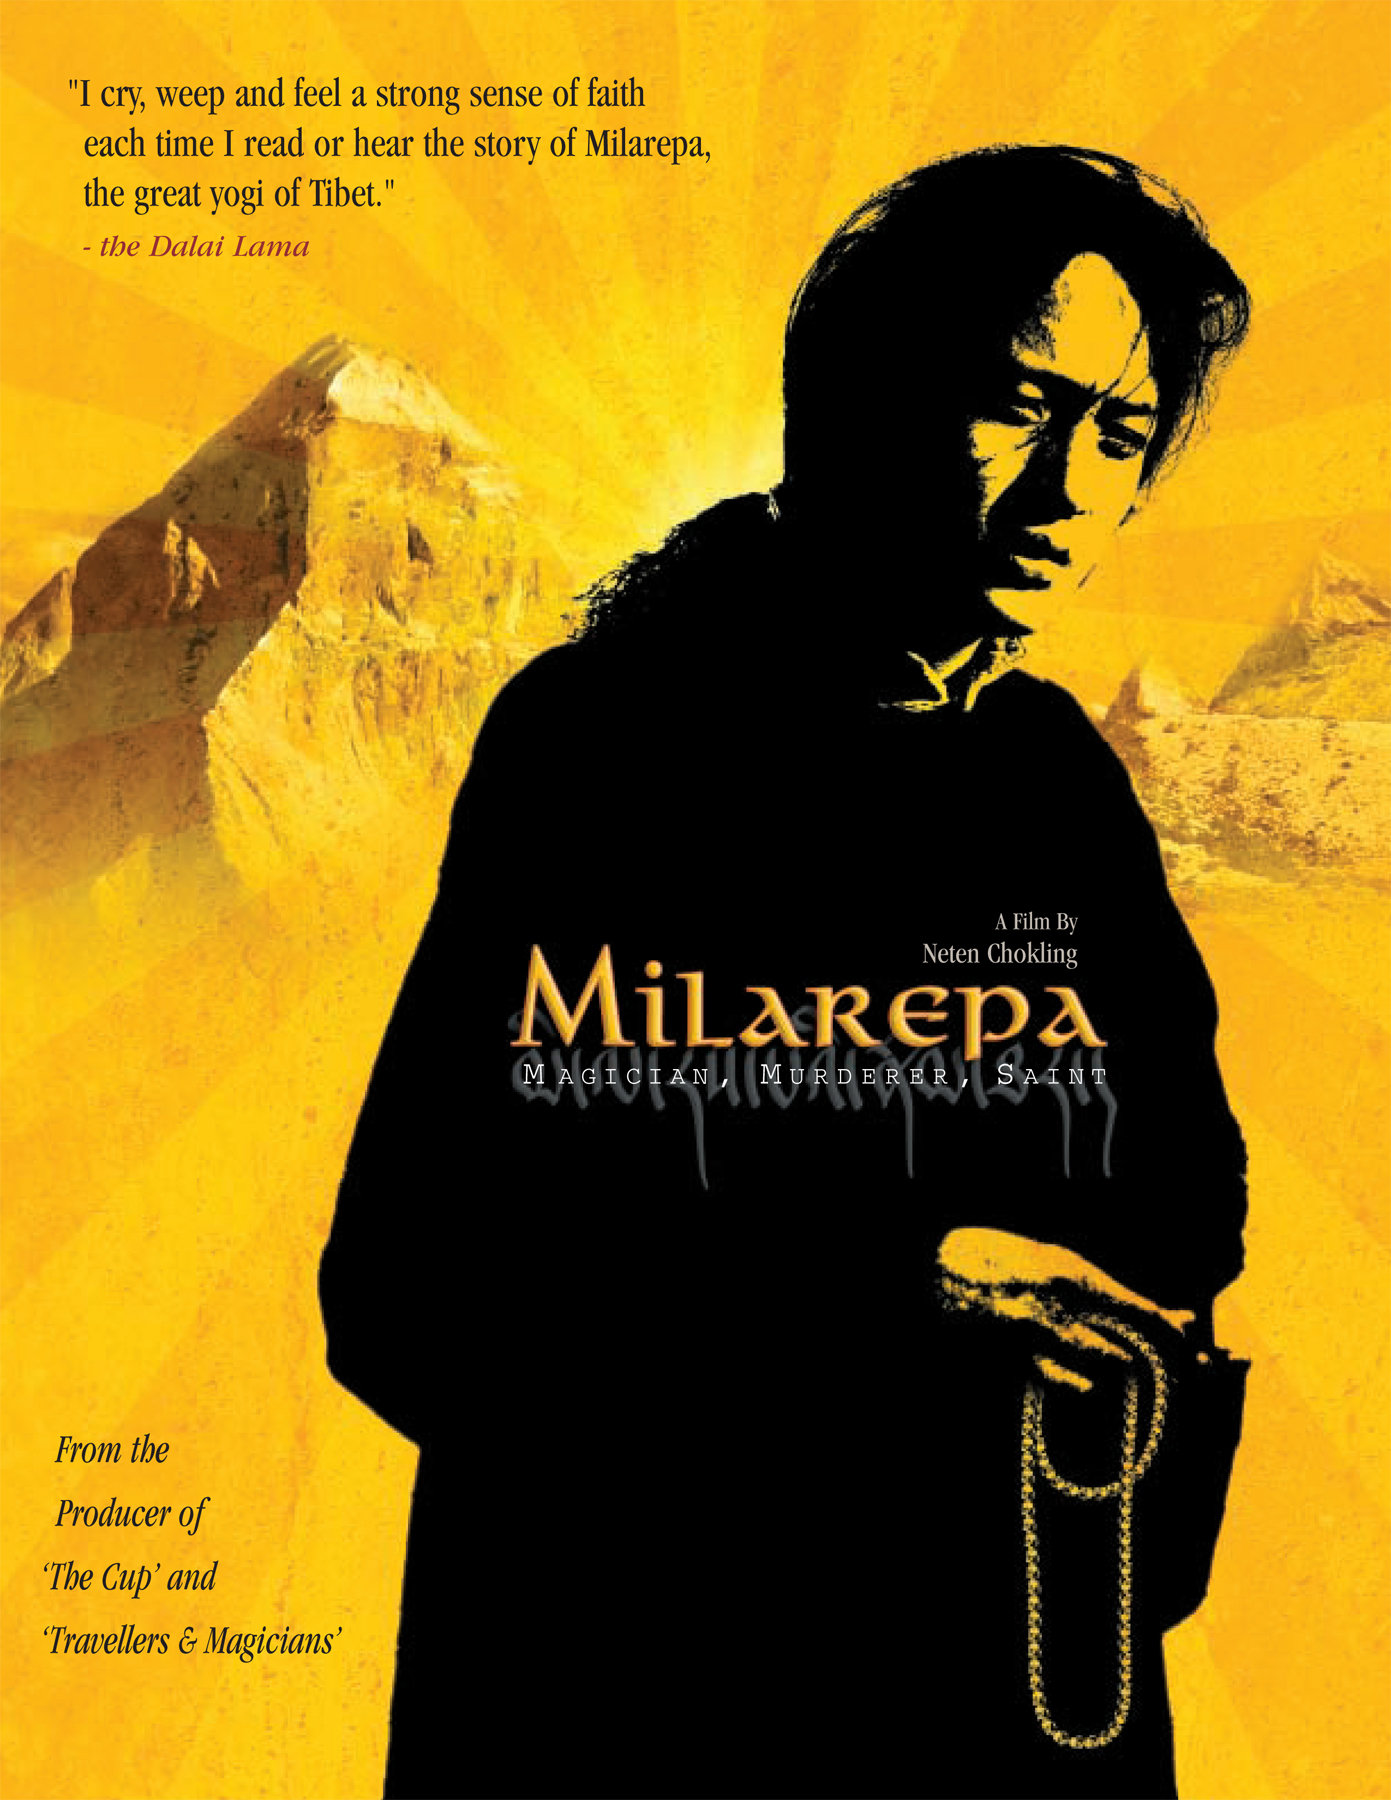 image Milarepa Watch Full Movie Free Online